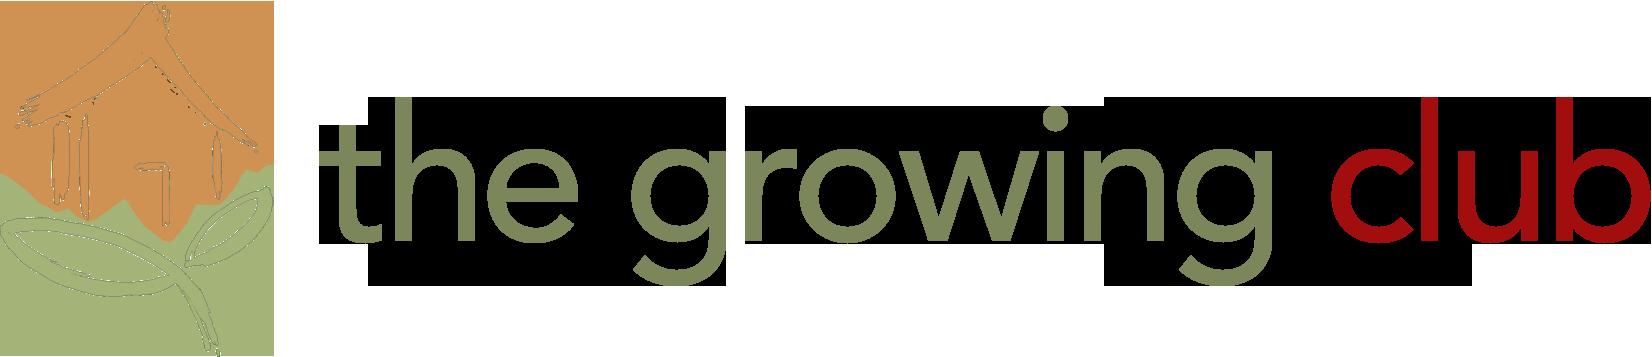 thegrowingclub-print.png